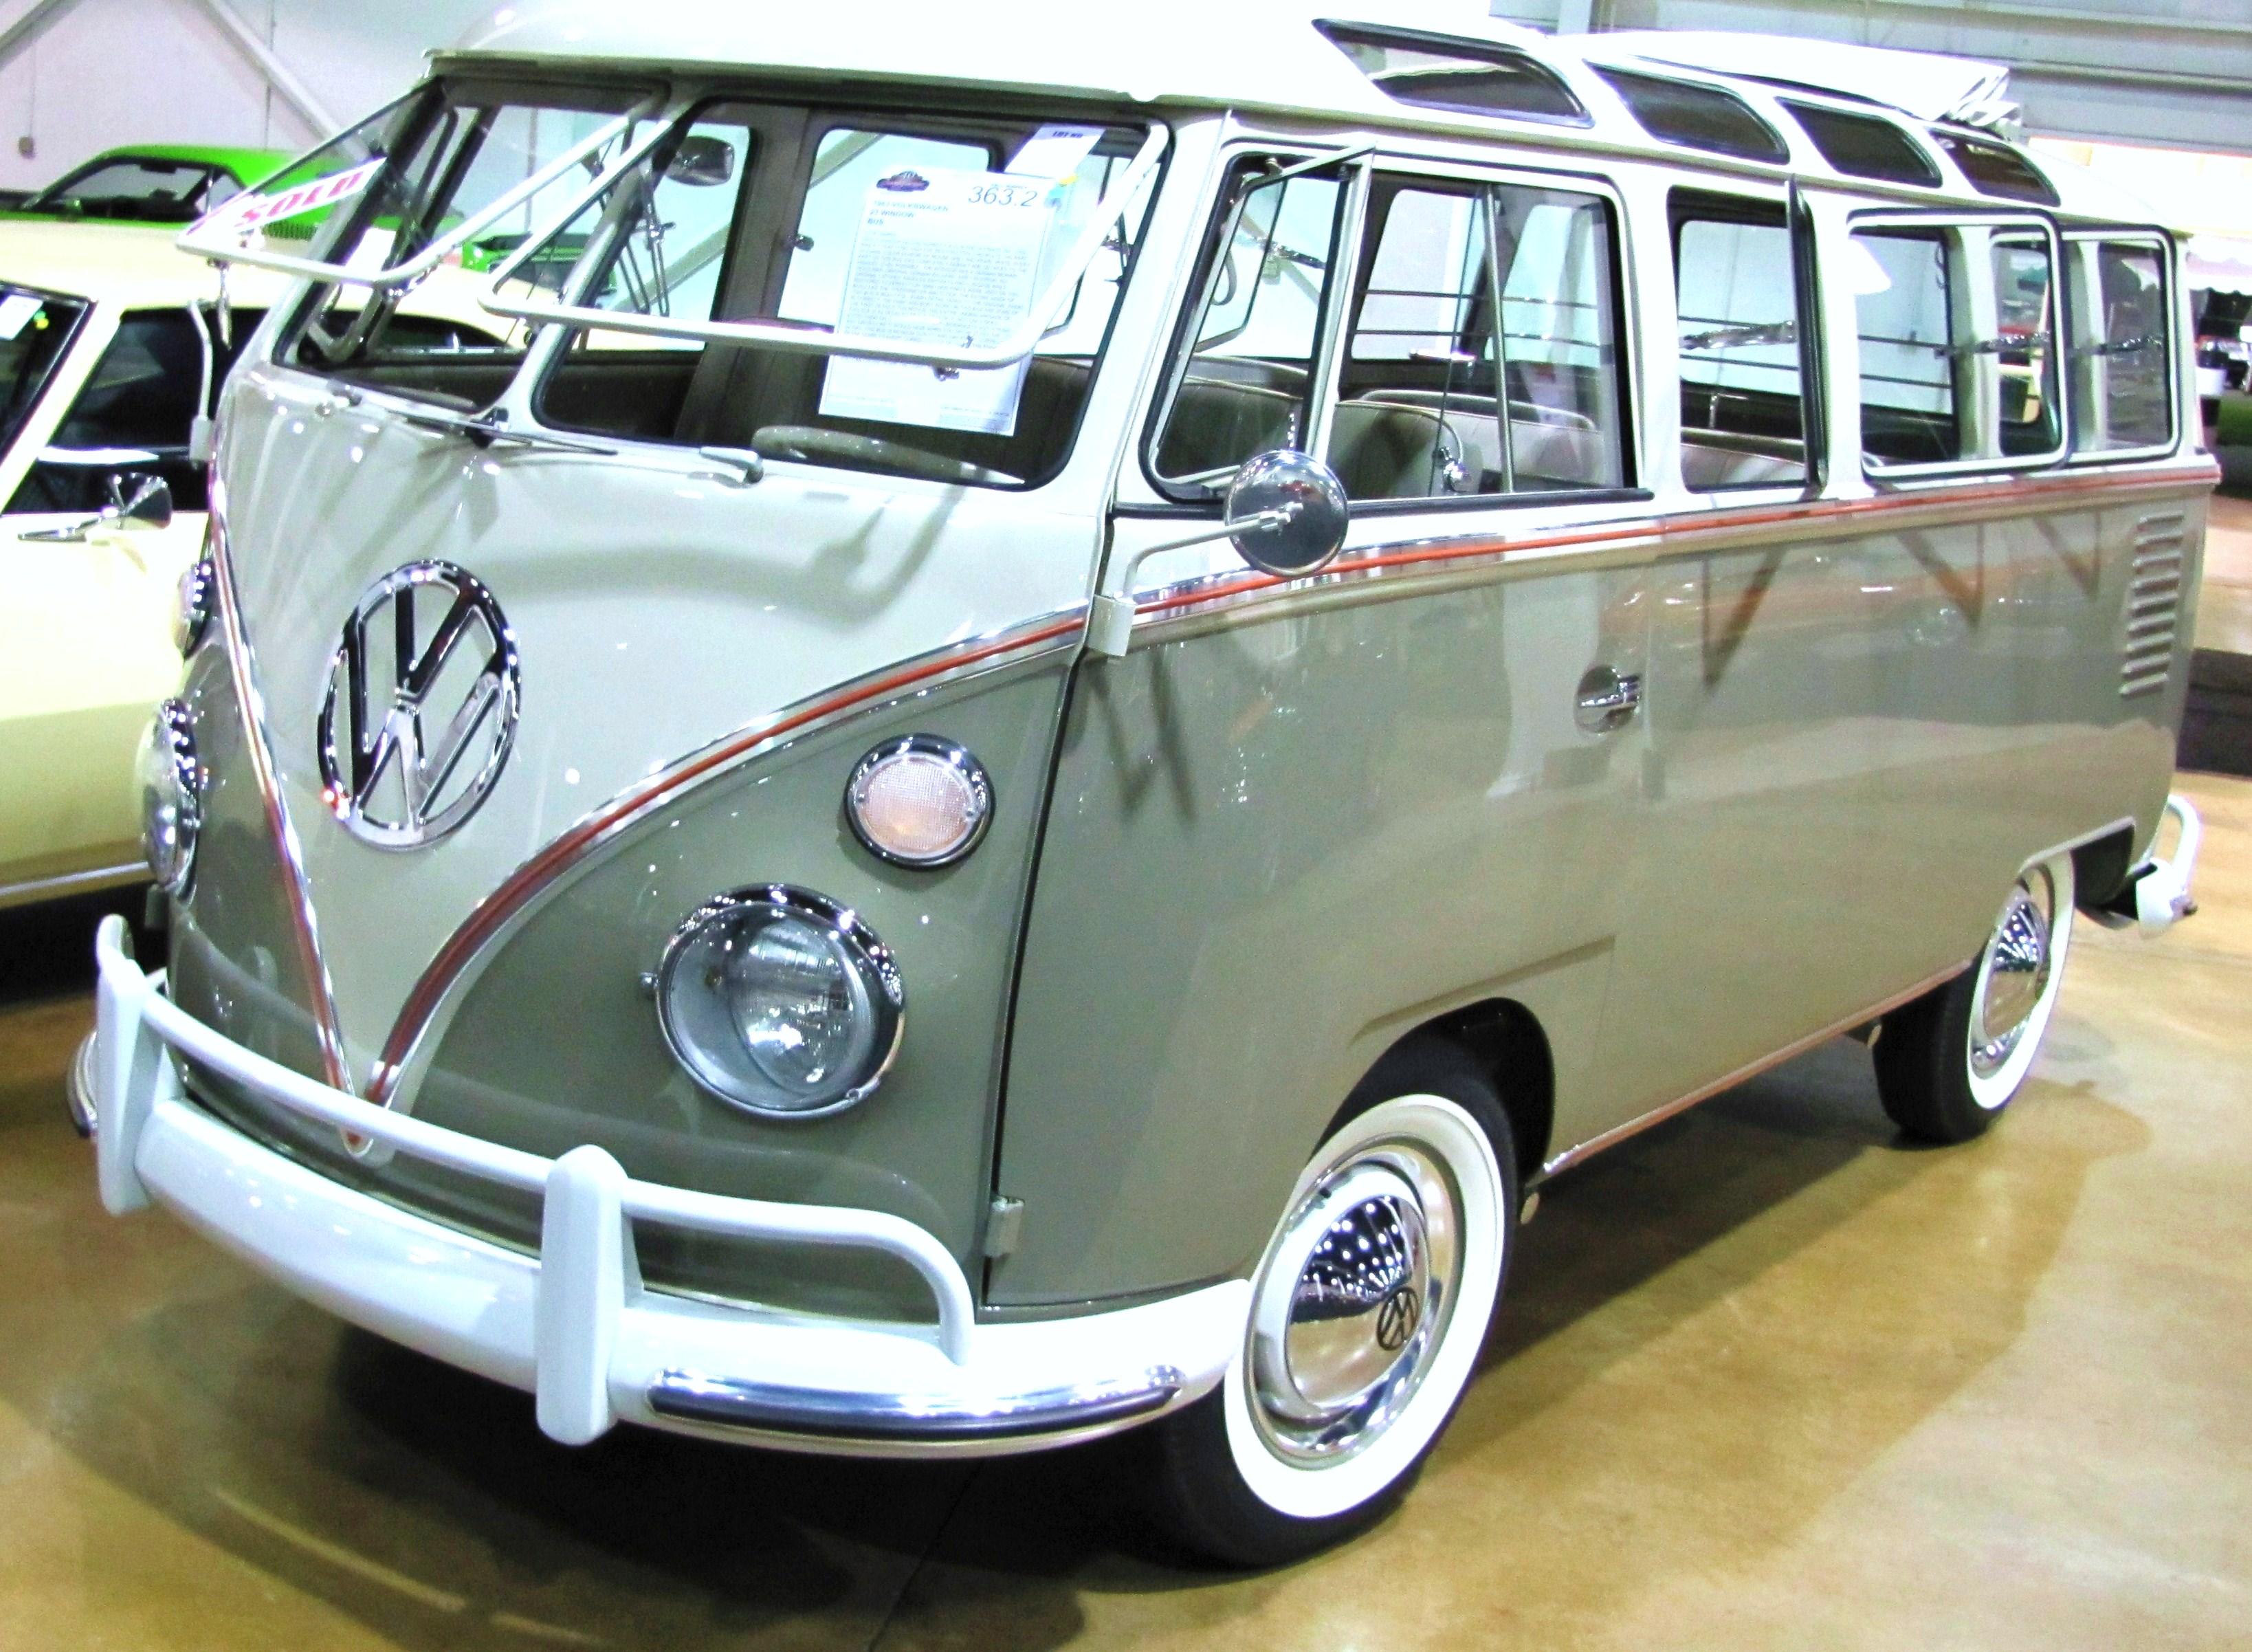 Still groovy, the VW microbus turns 65 - ClassicCars.com ...